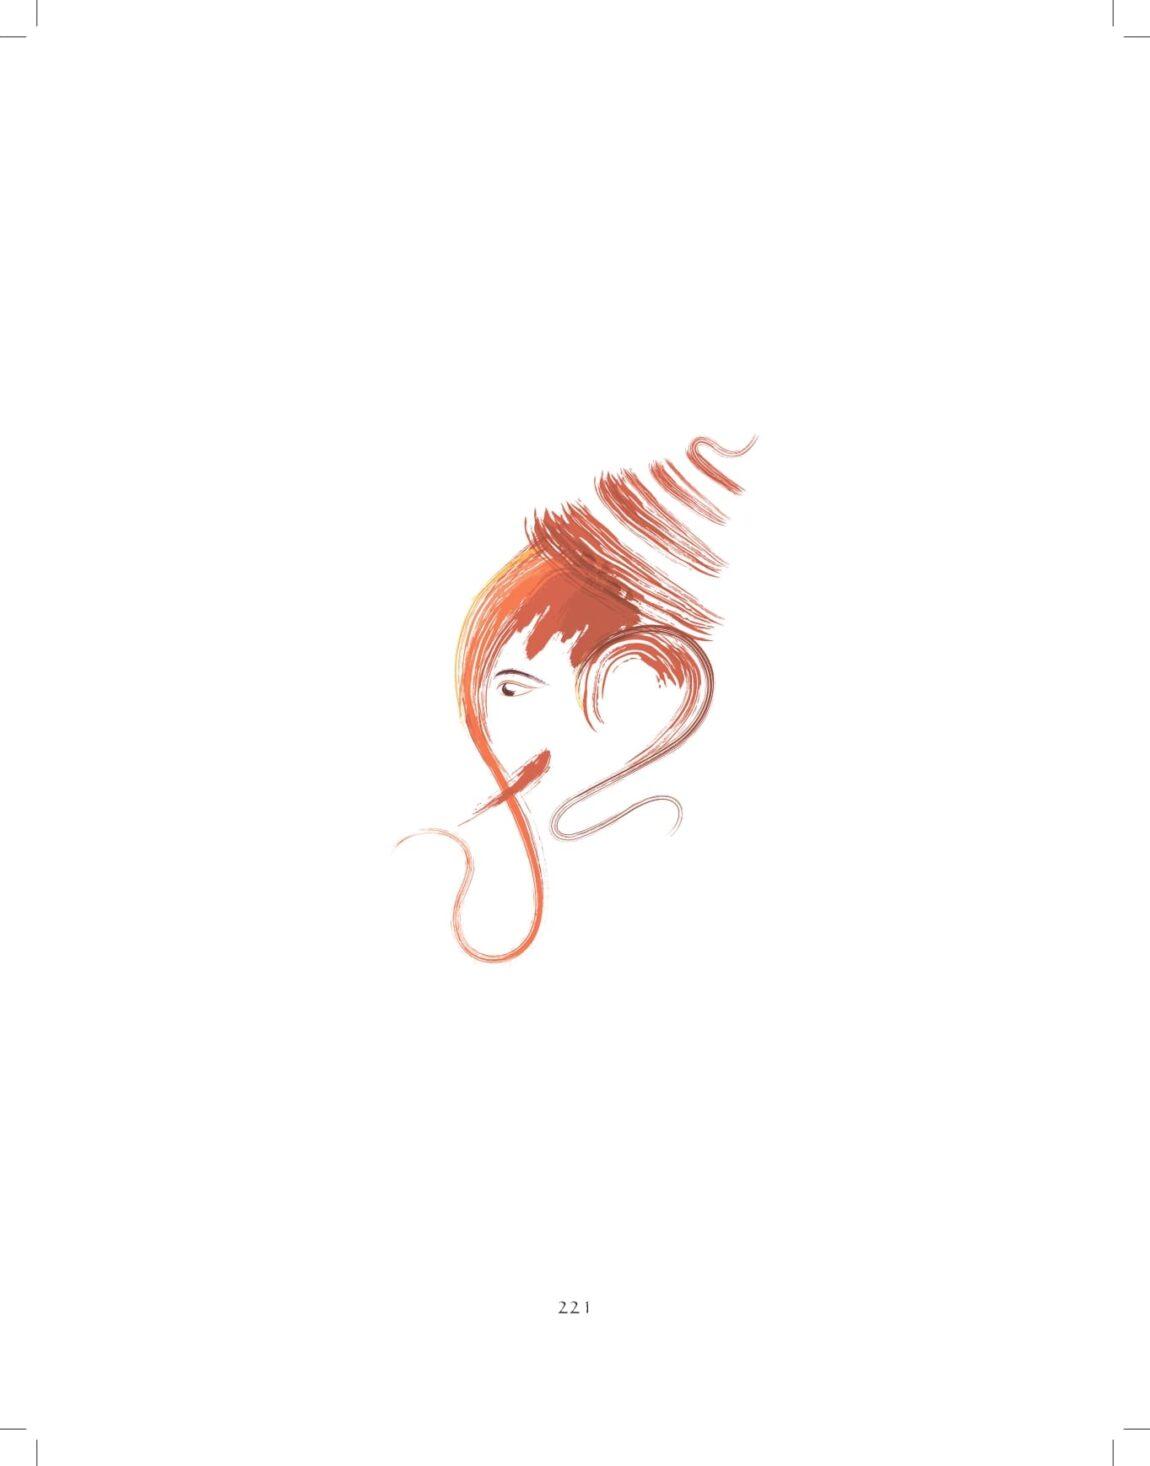 Ganesh-print_pages-to-jpg-0221.jpg